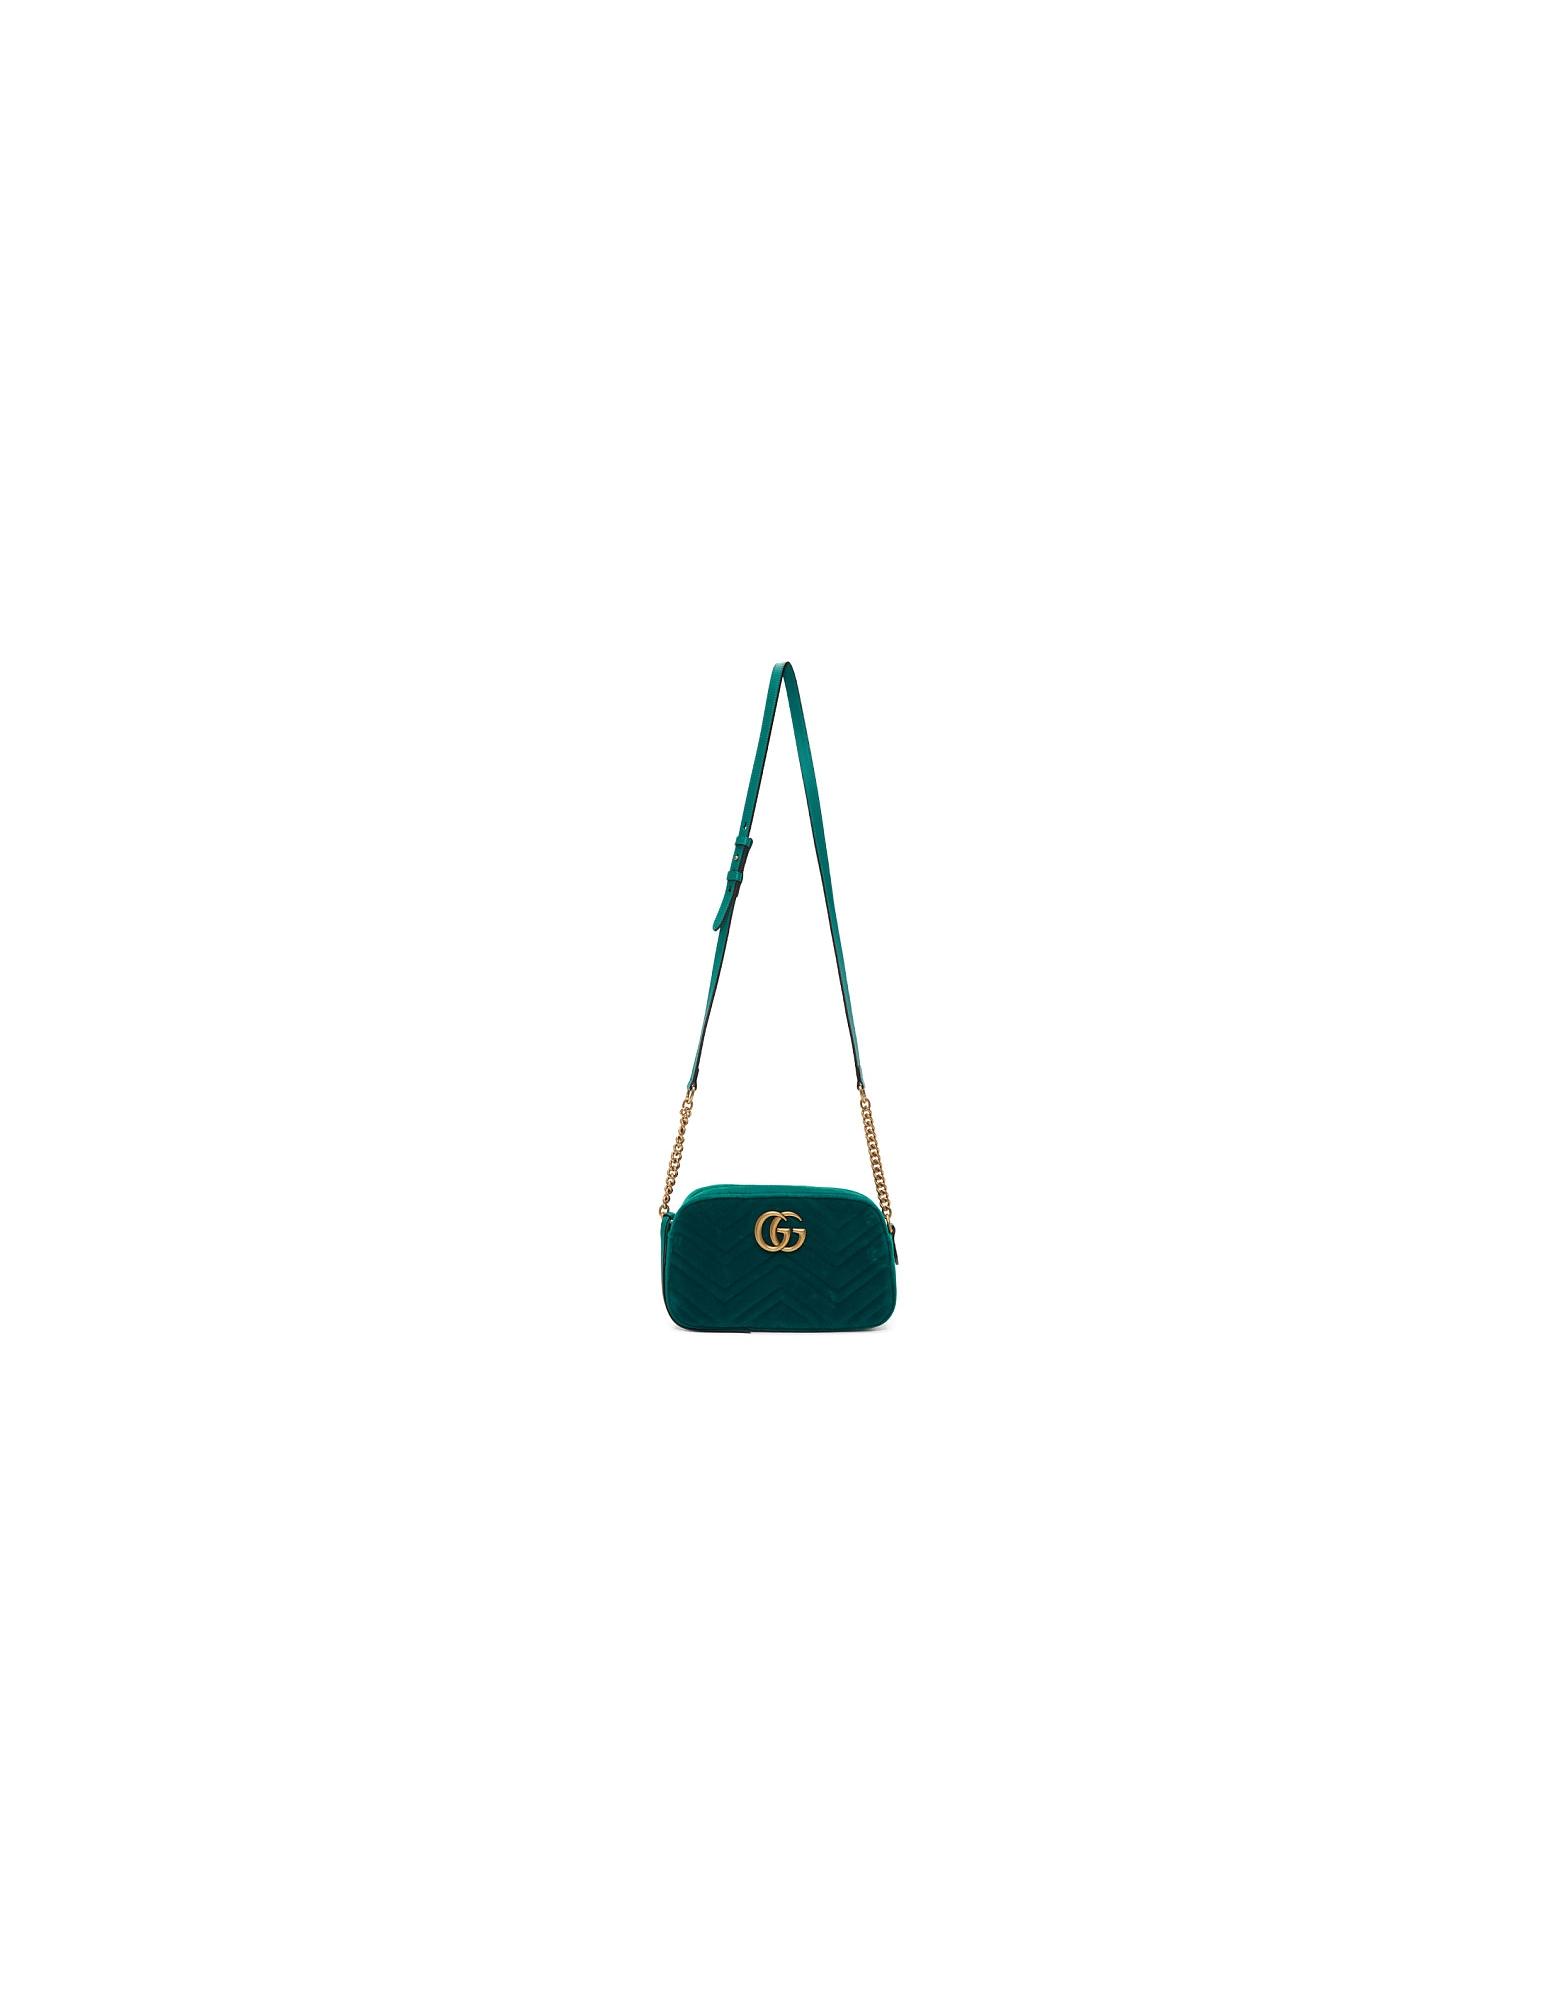 Gucci Designer Handbags, Green Velvet Small GG Marmont Shoulder Bag